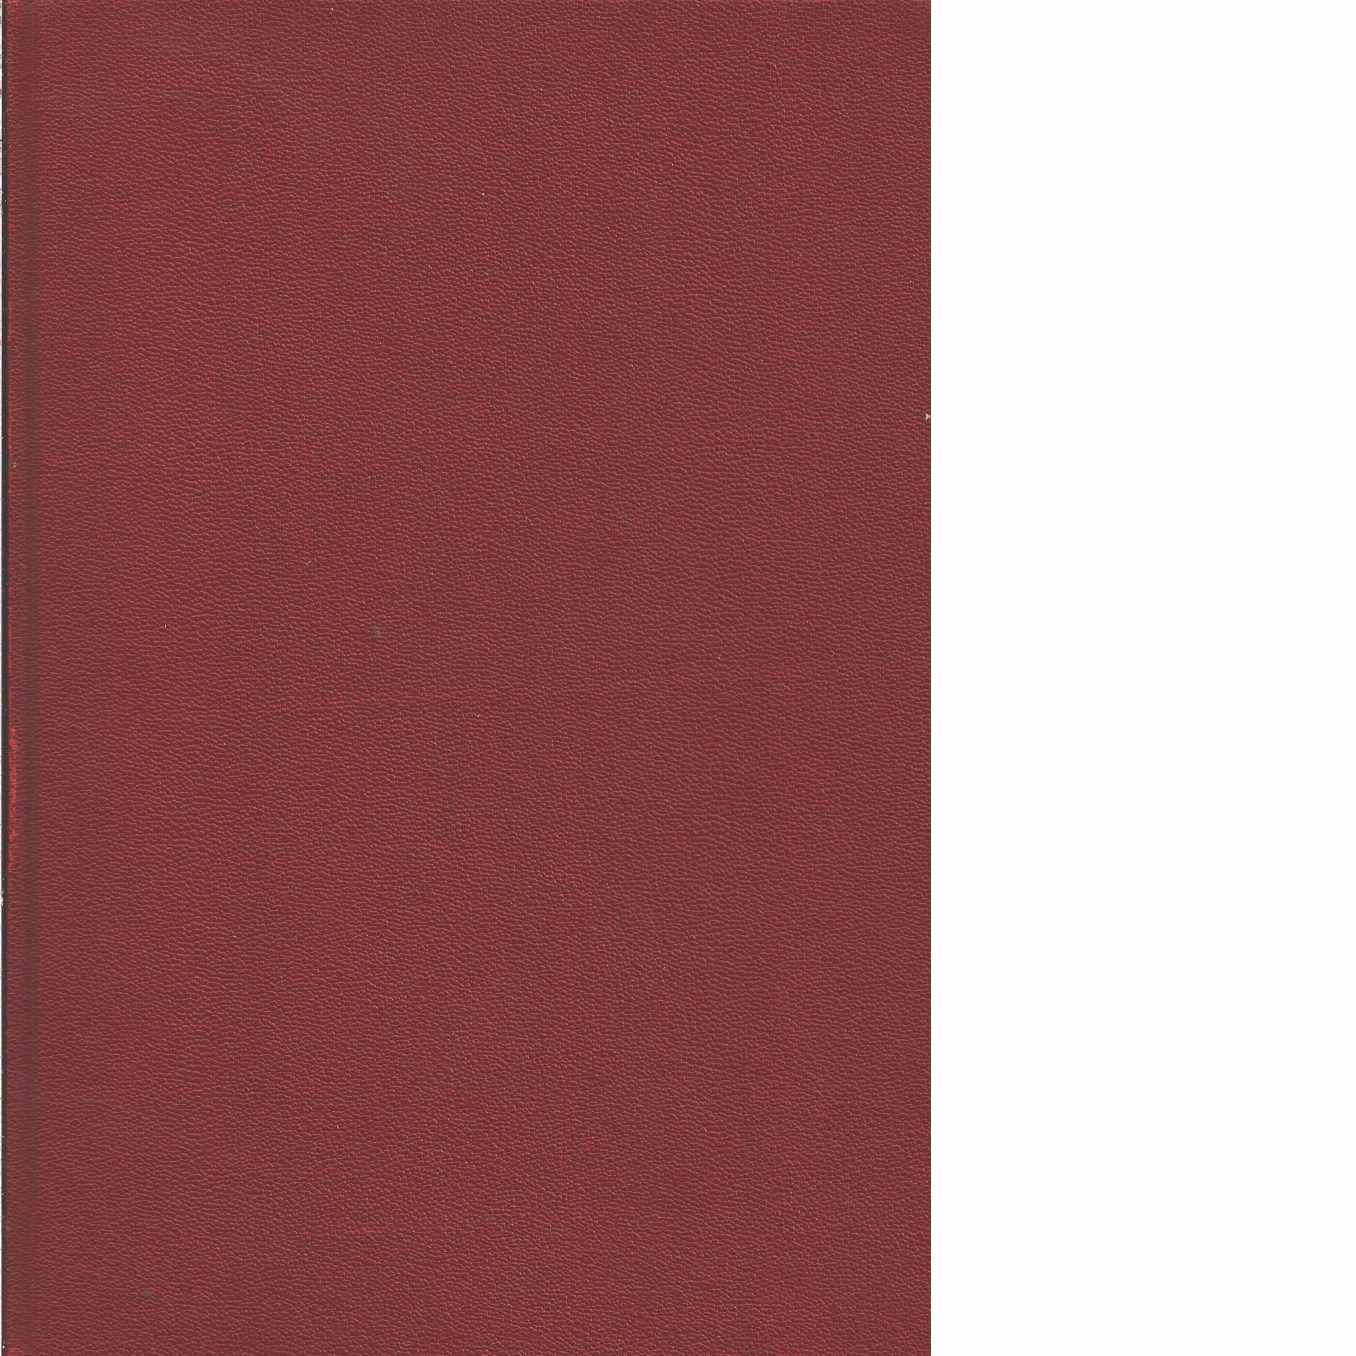 Chassiboken.[1], Ram : karosseri - Red. Engström, Sigvard m.fl.